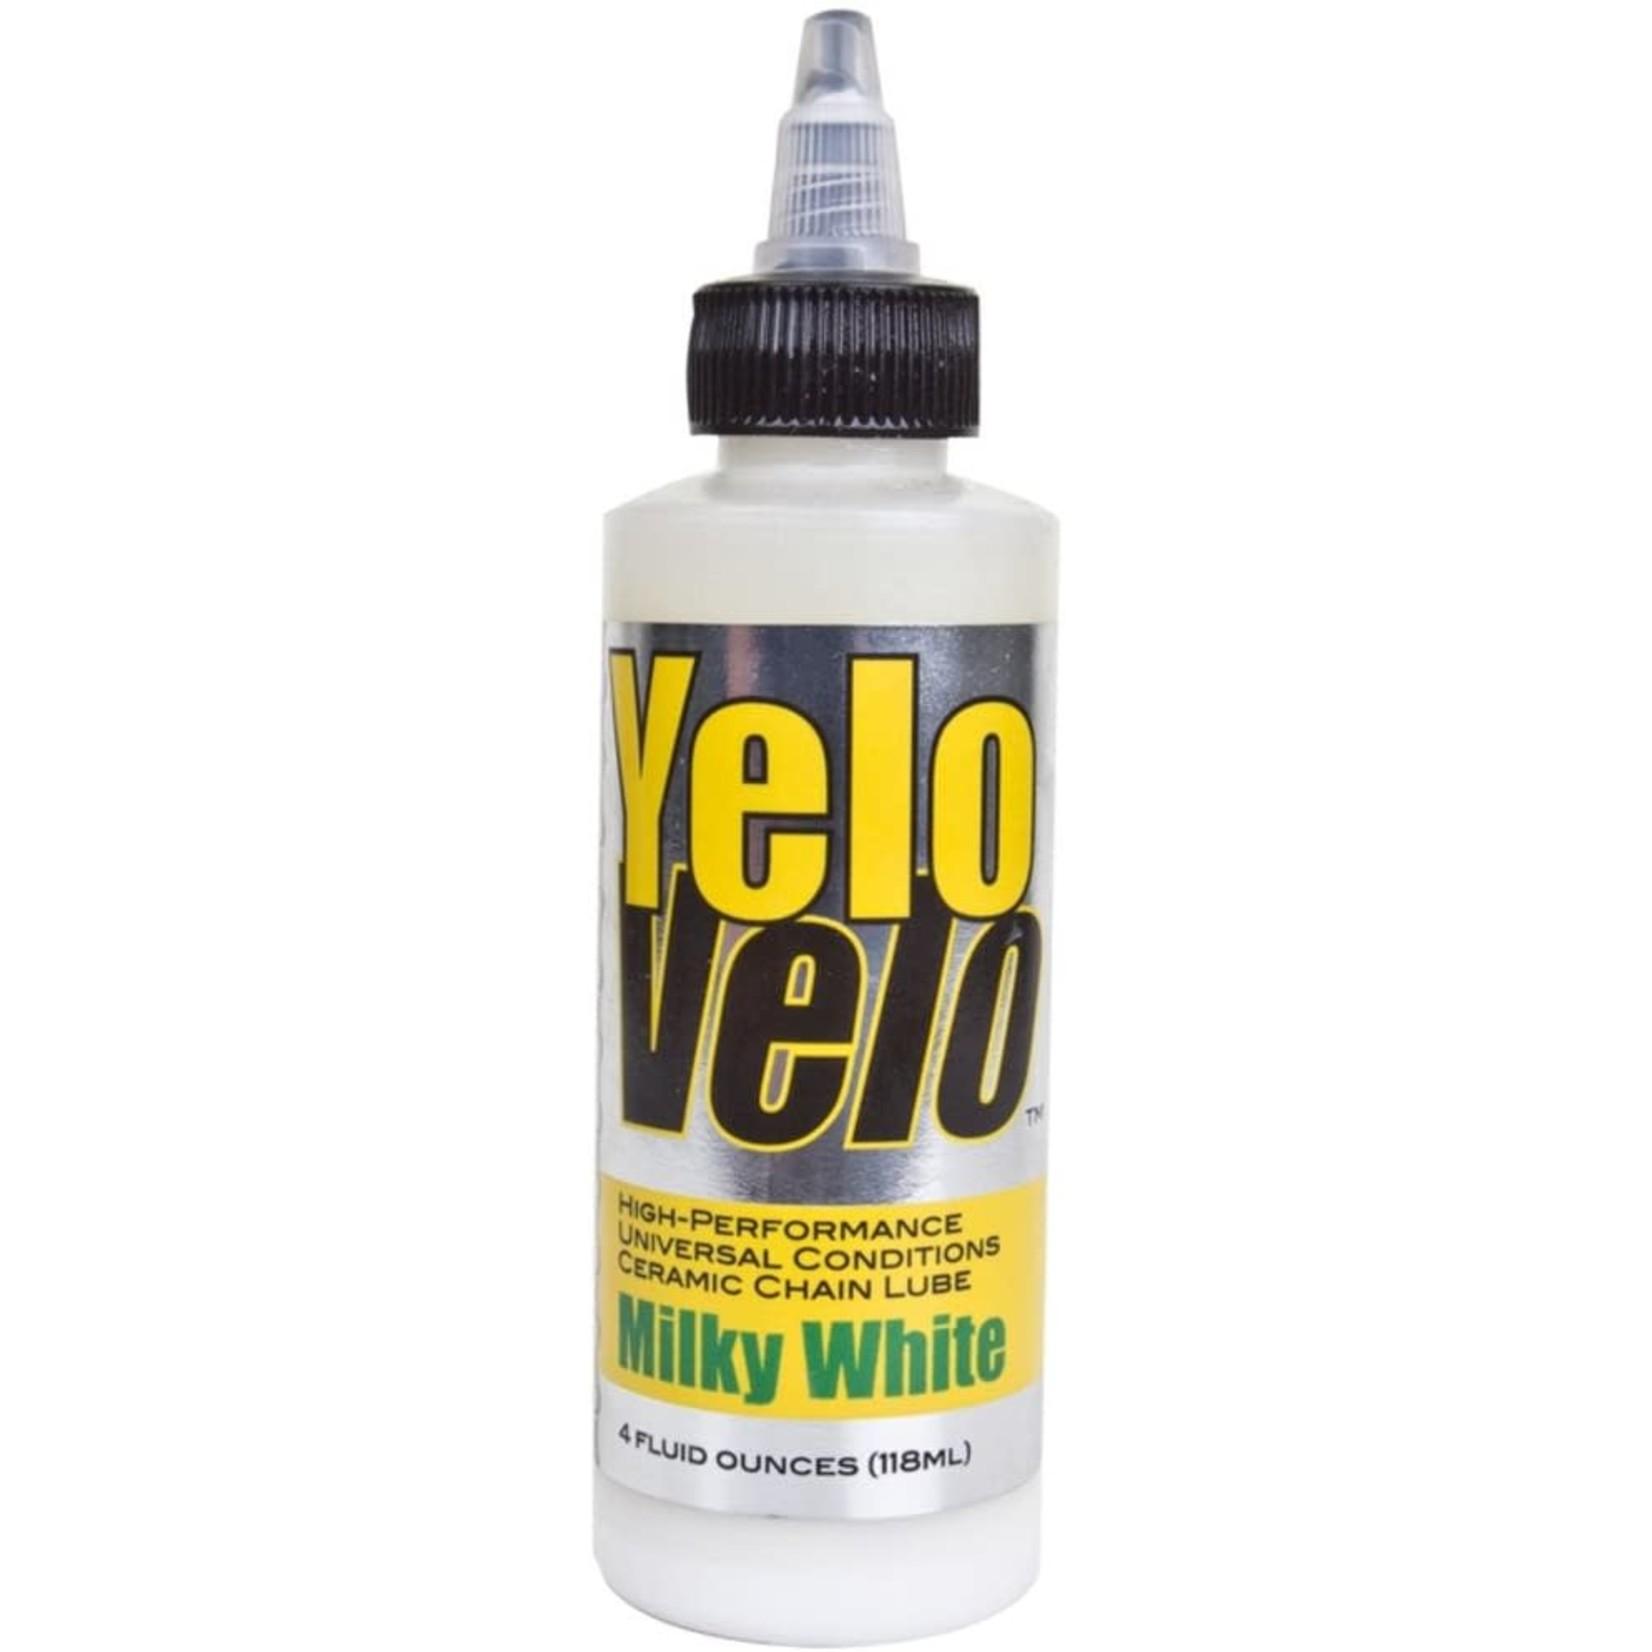 Yelo Velo YELO VELO MILKY WHITE 4 OZ.